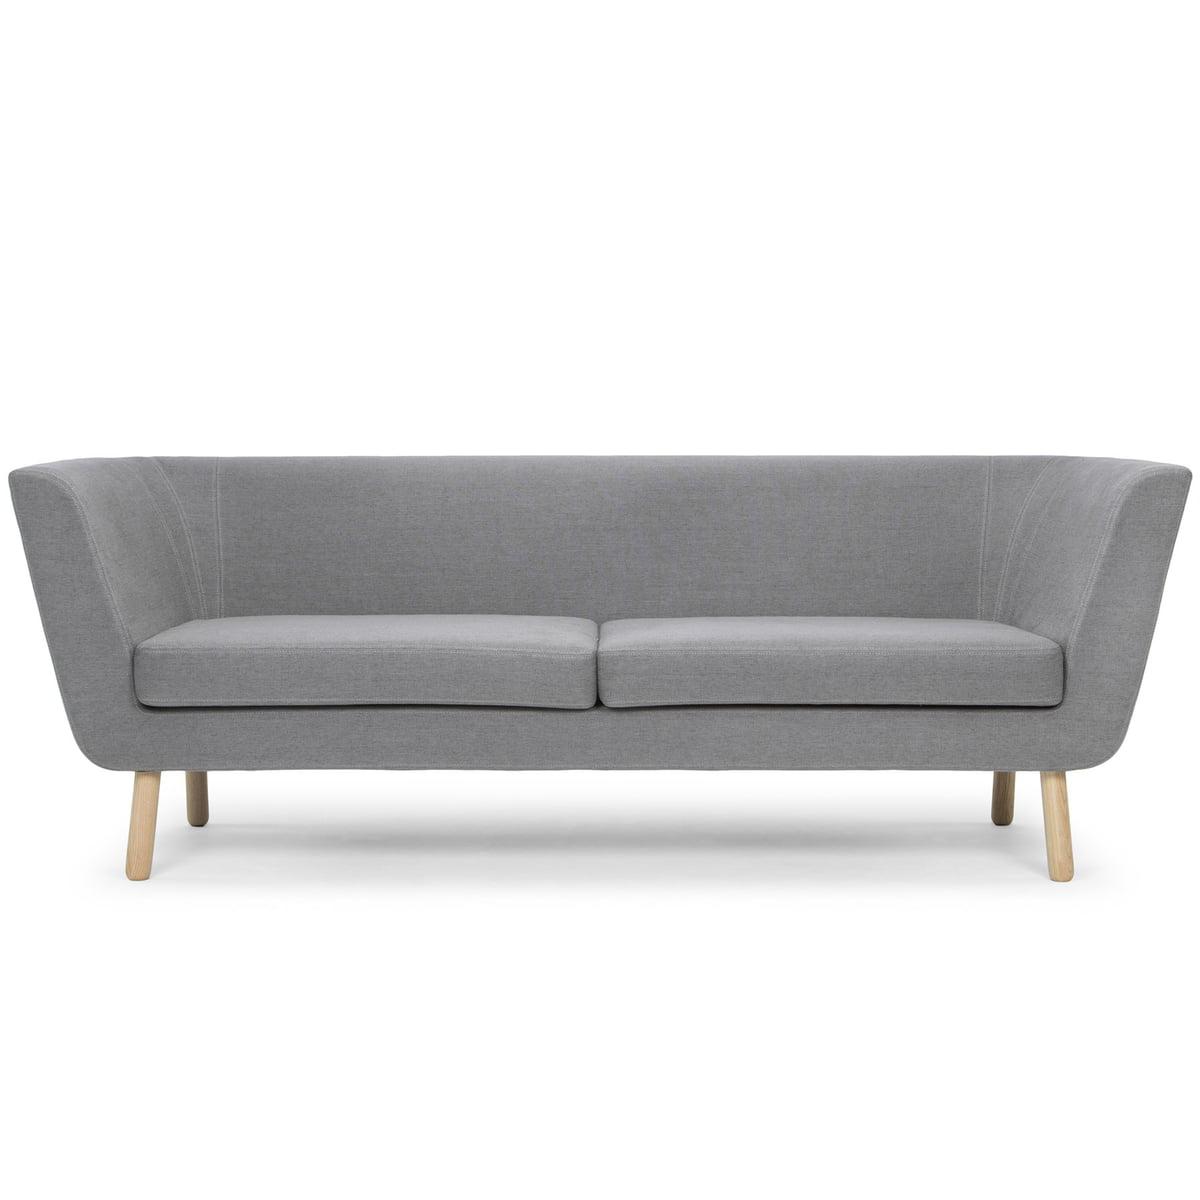 ... Nest Sofa By Design House Stockholm In Light Grey ...